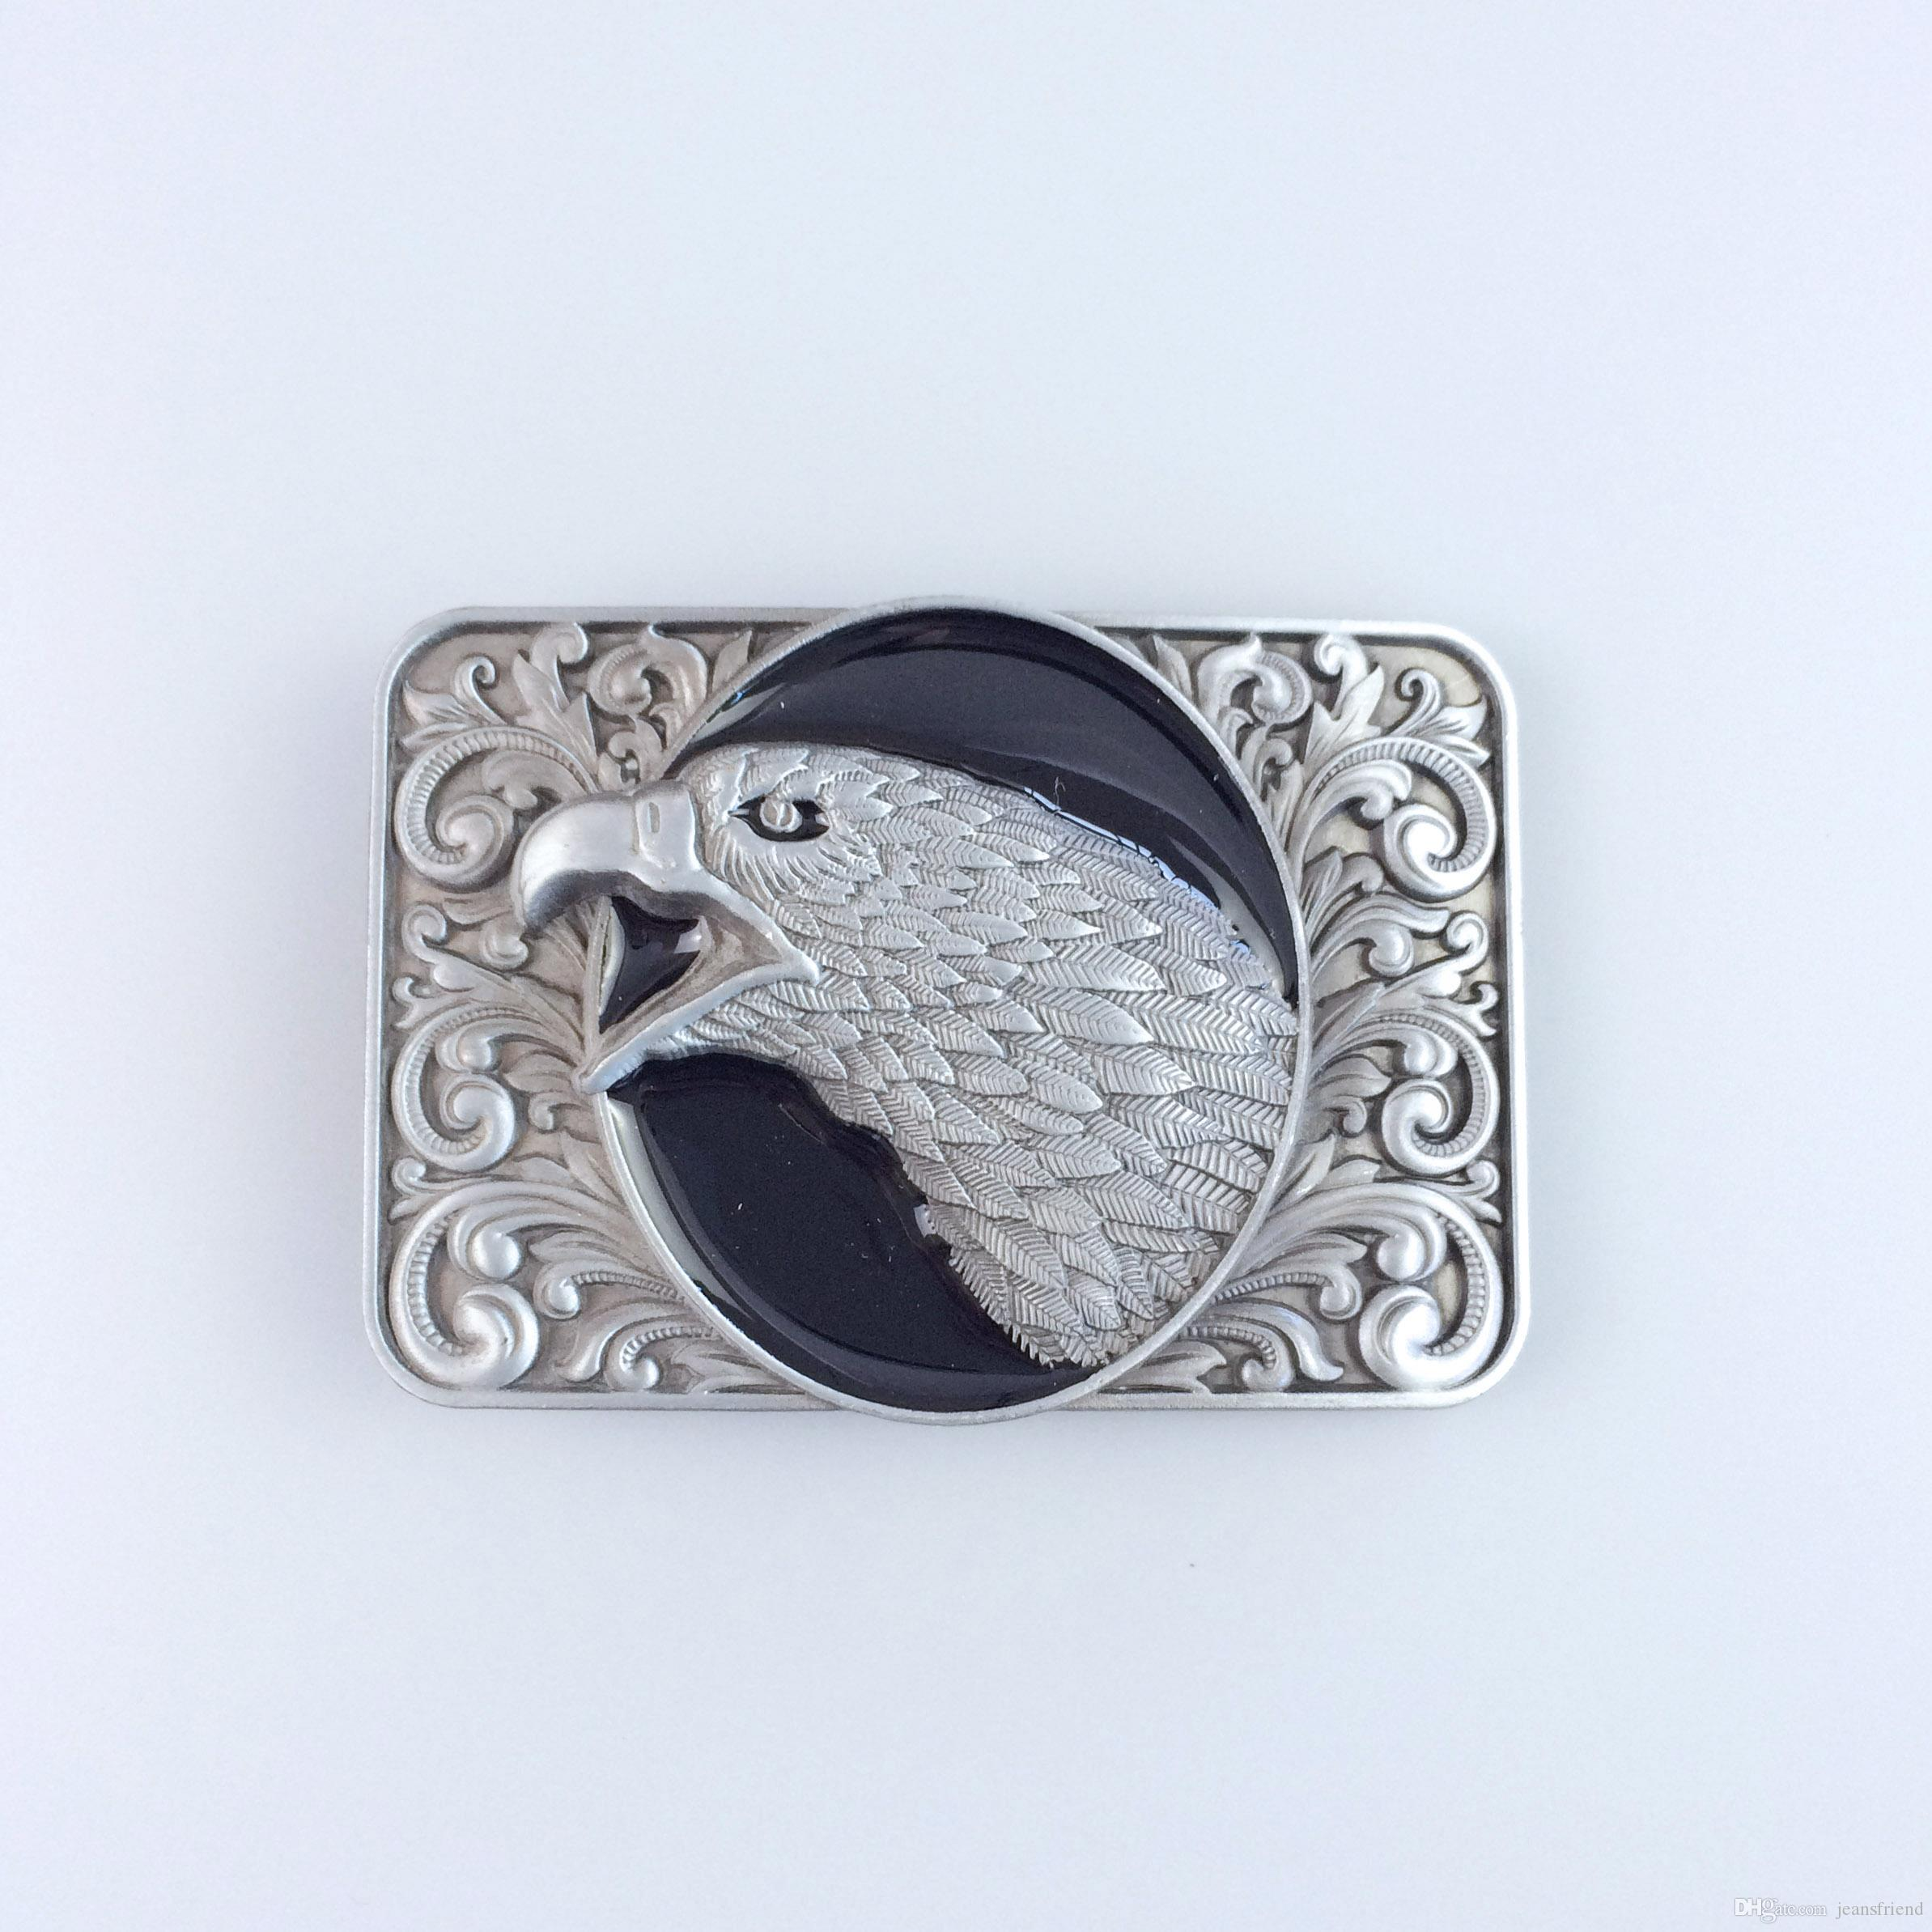 New Vintage Black Enamel Bald Eagle Head Ornate Western Belt Buckle  Gurtelschnalle Boucle De Ceinture Belt Buckle Drum Kit Music Online with   12.94 Piece on ... 4db3f492a80